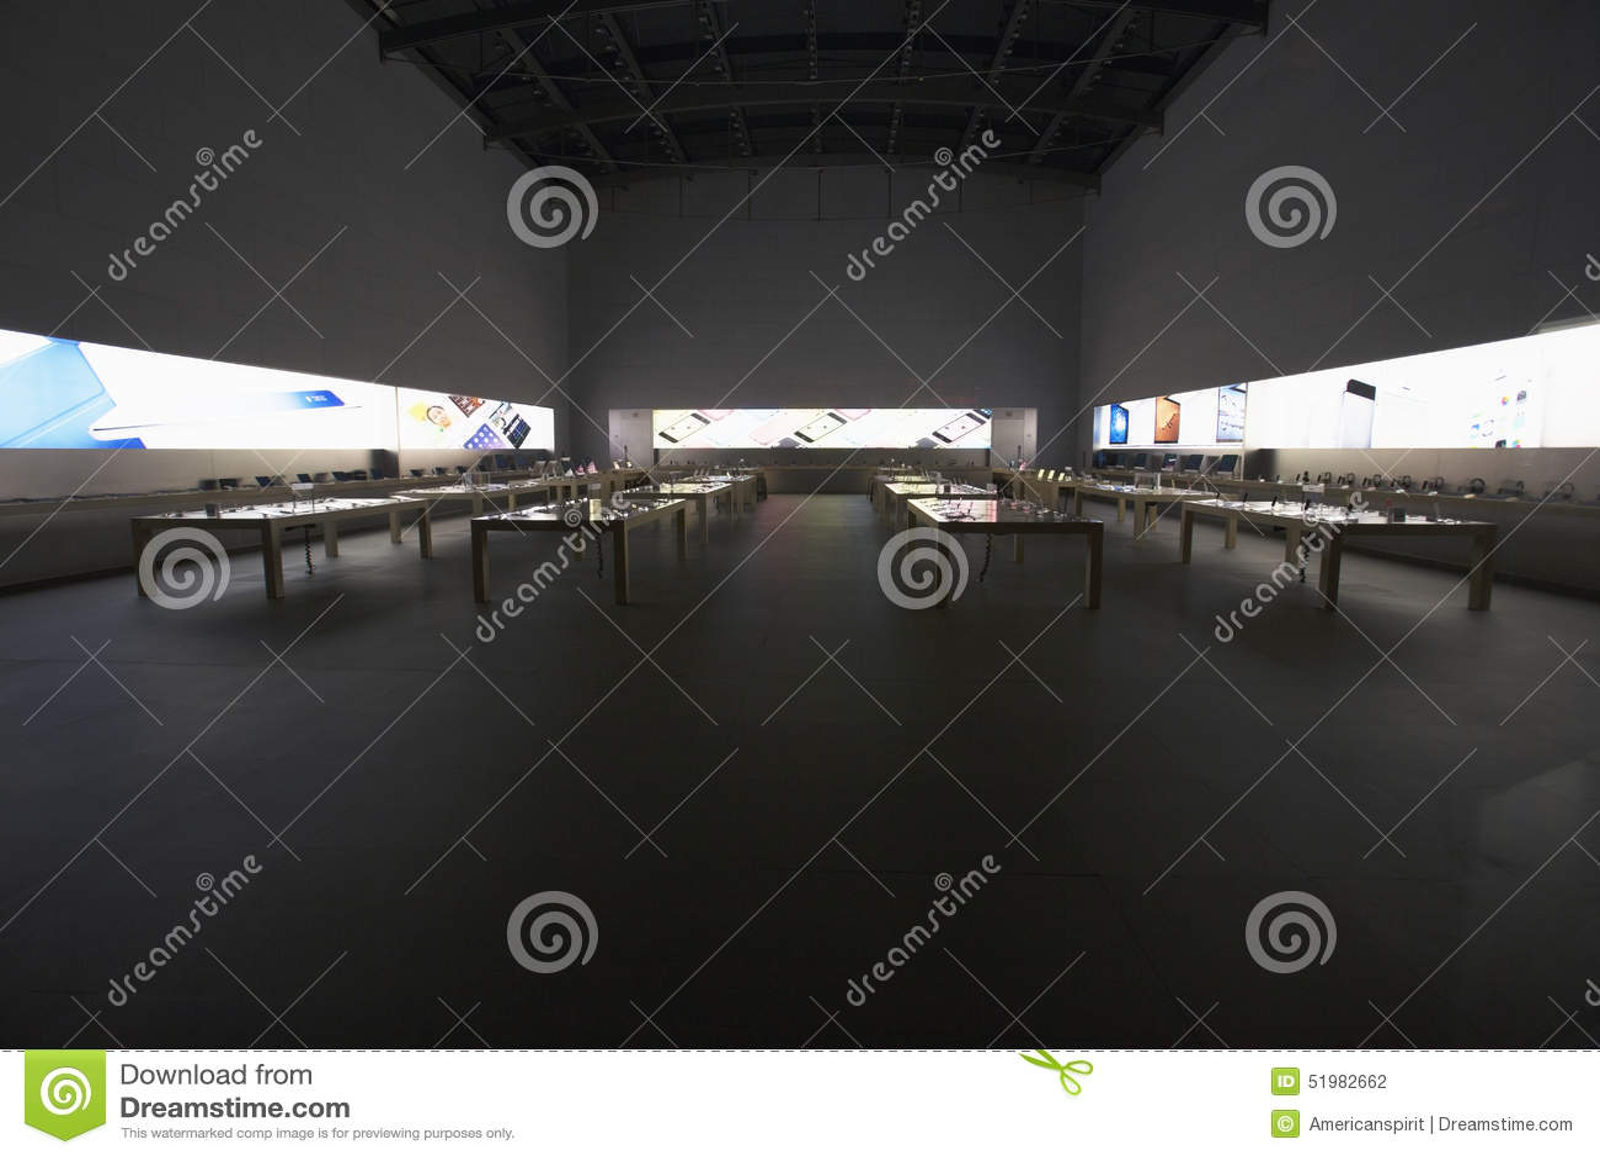 Apple store broadway nyc